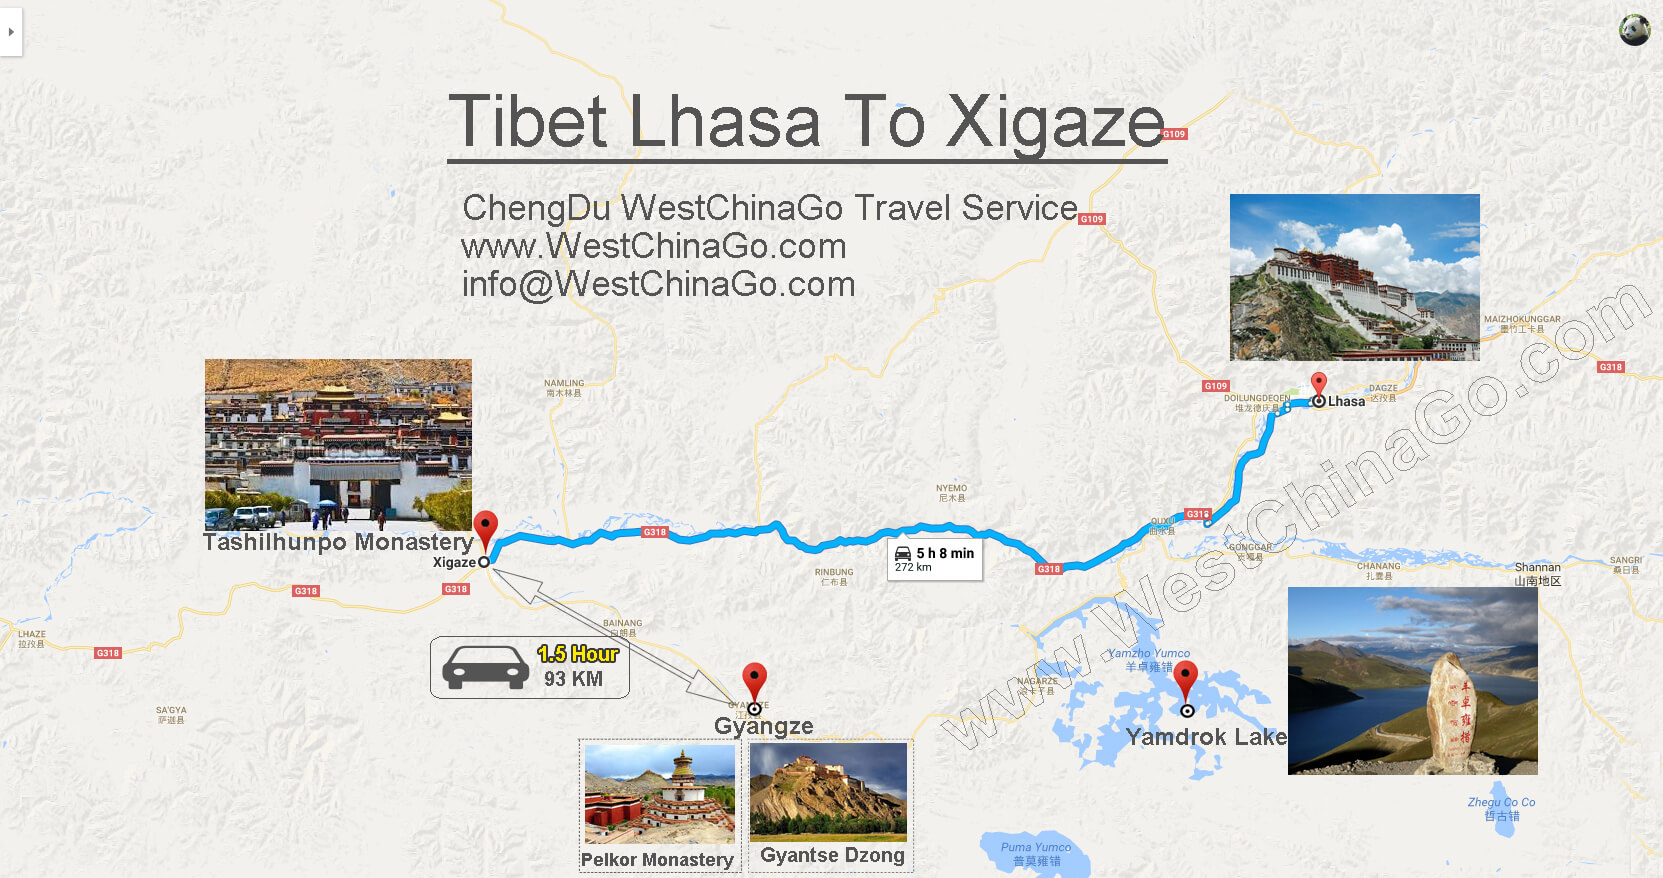 chengdu China to Lhasa Tibet China  tour map